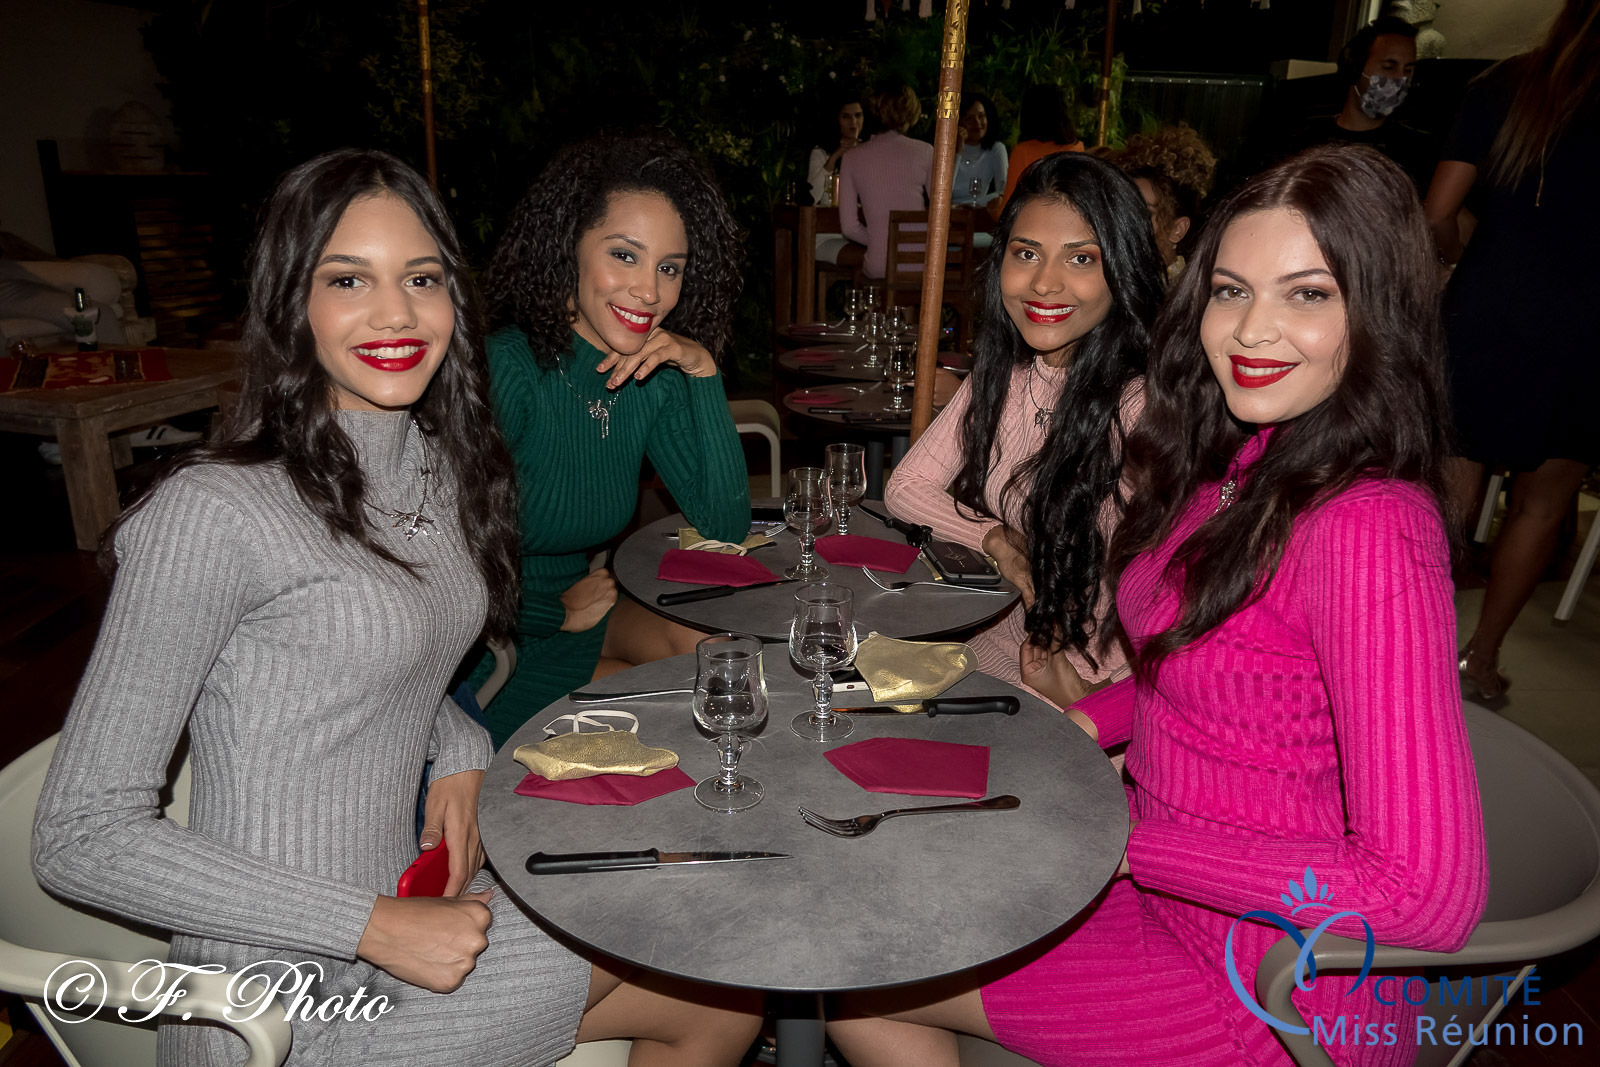 Aurore, Florence, Dana et Virginie